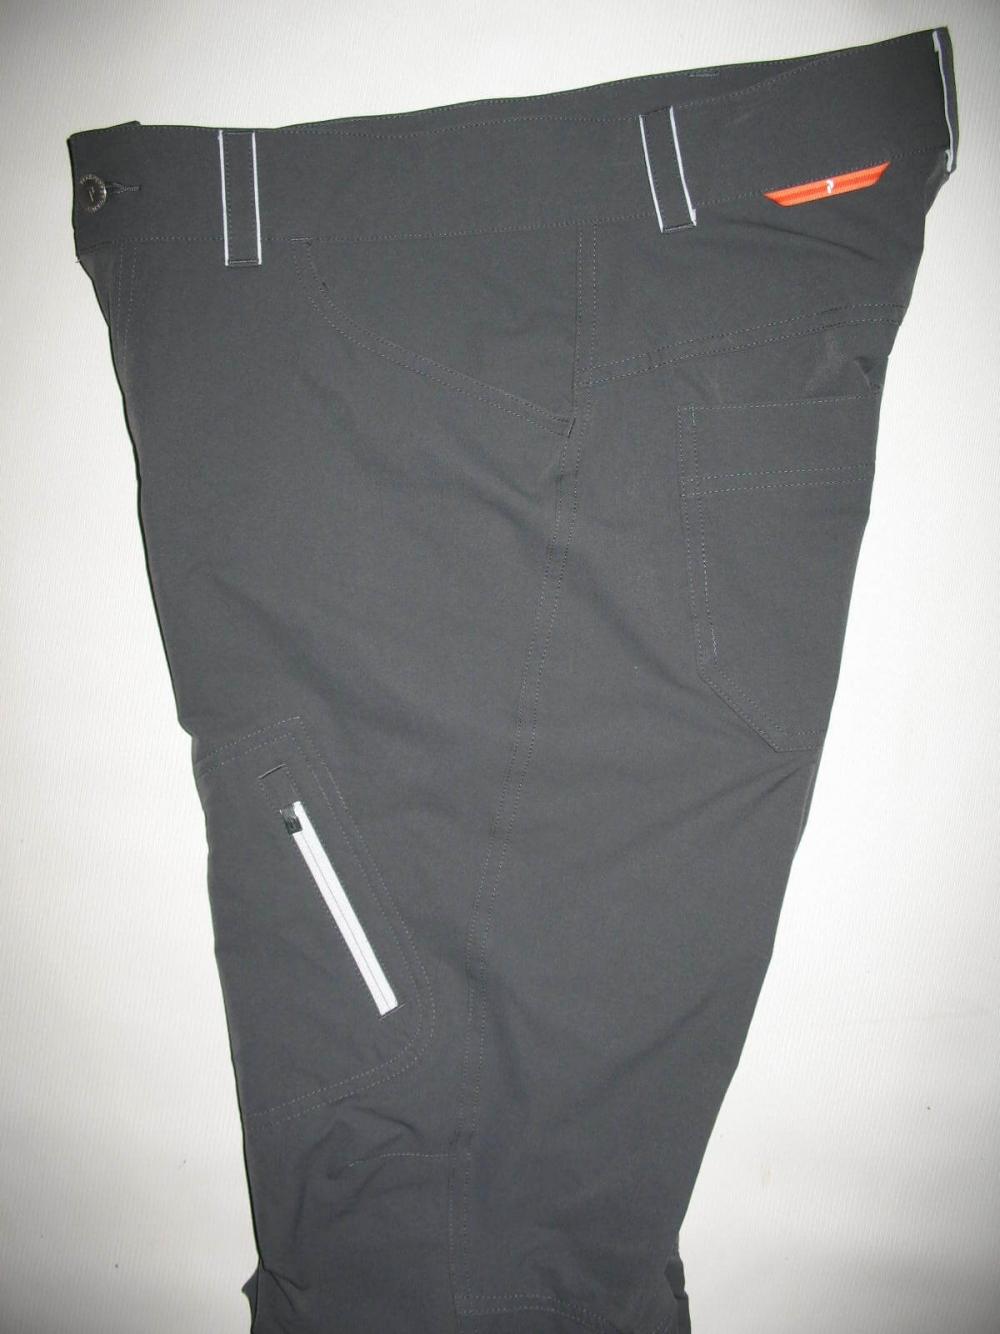 Штаны PEAK PERFOMANCE agile pants lady/unisex (размер S/M) - 9